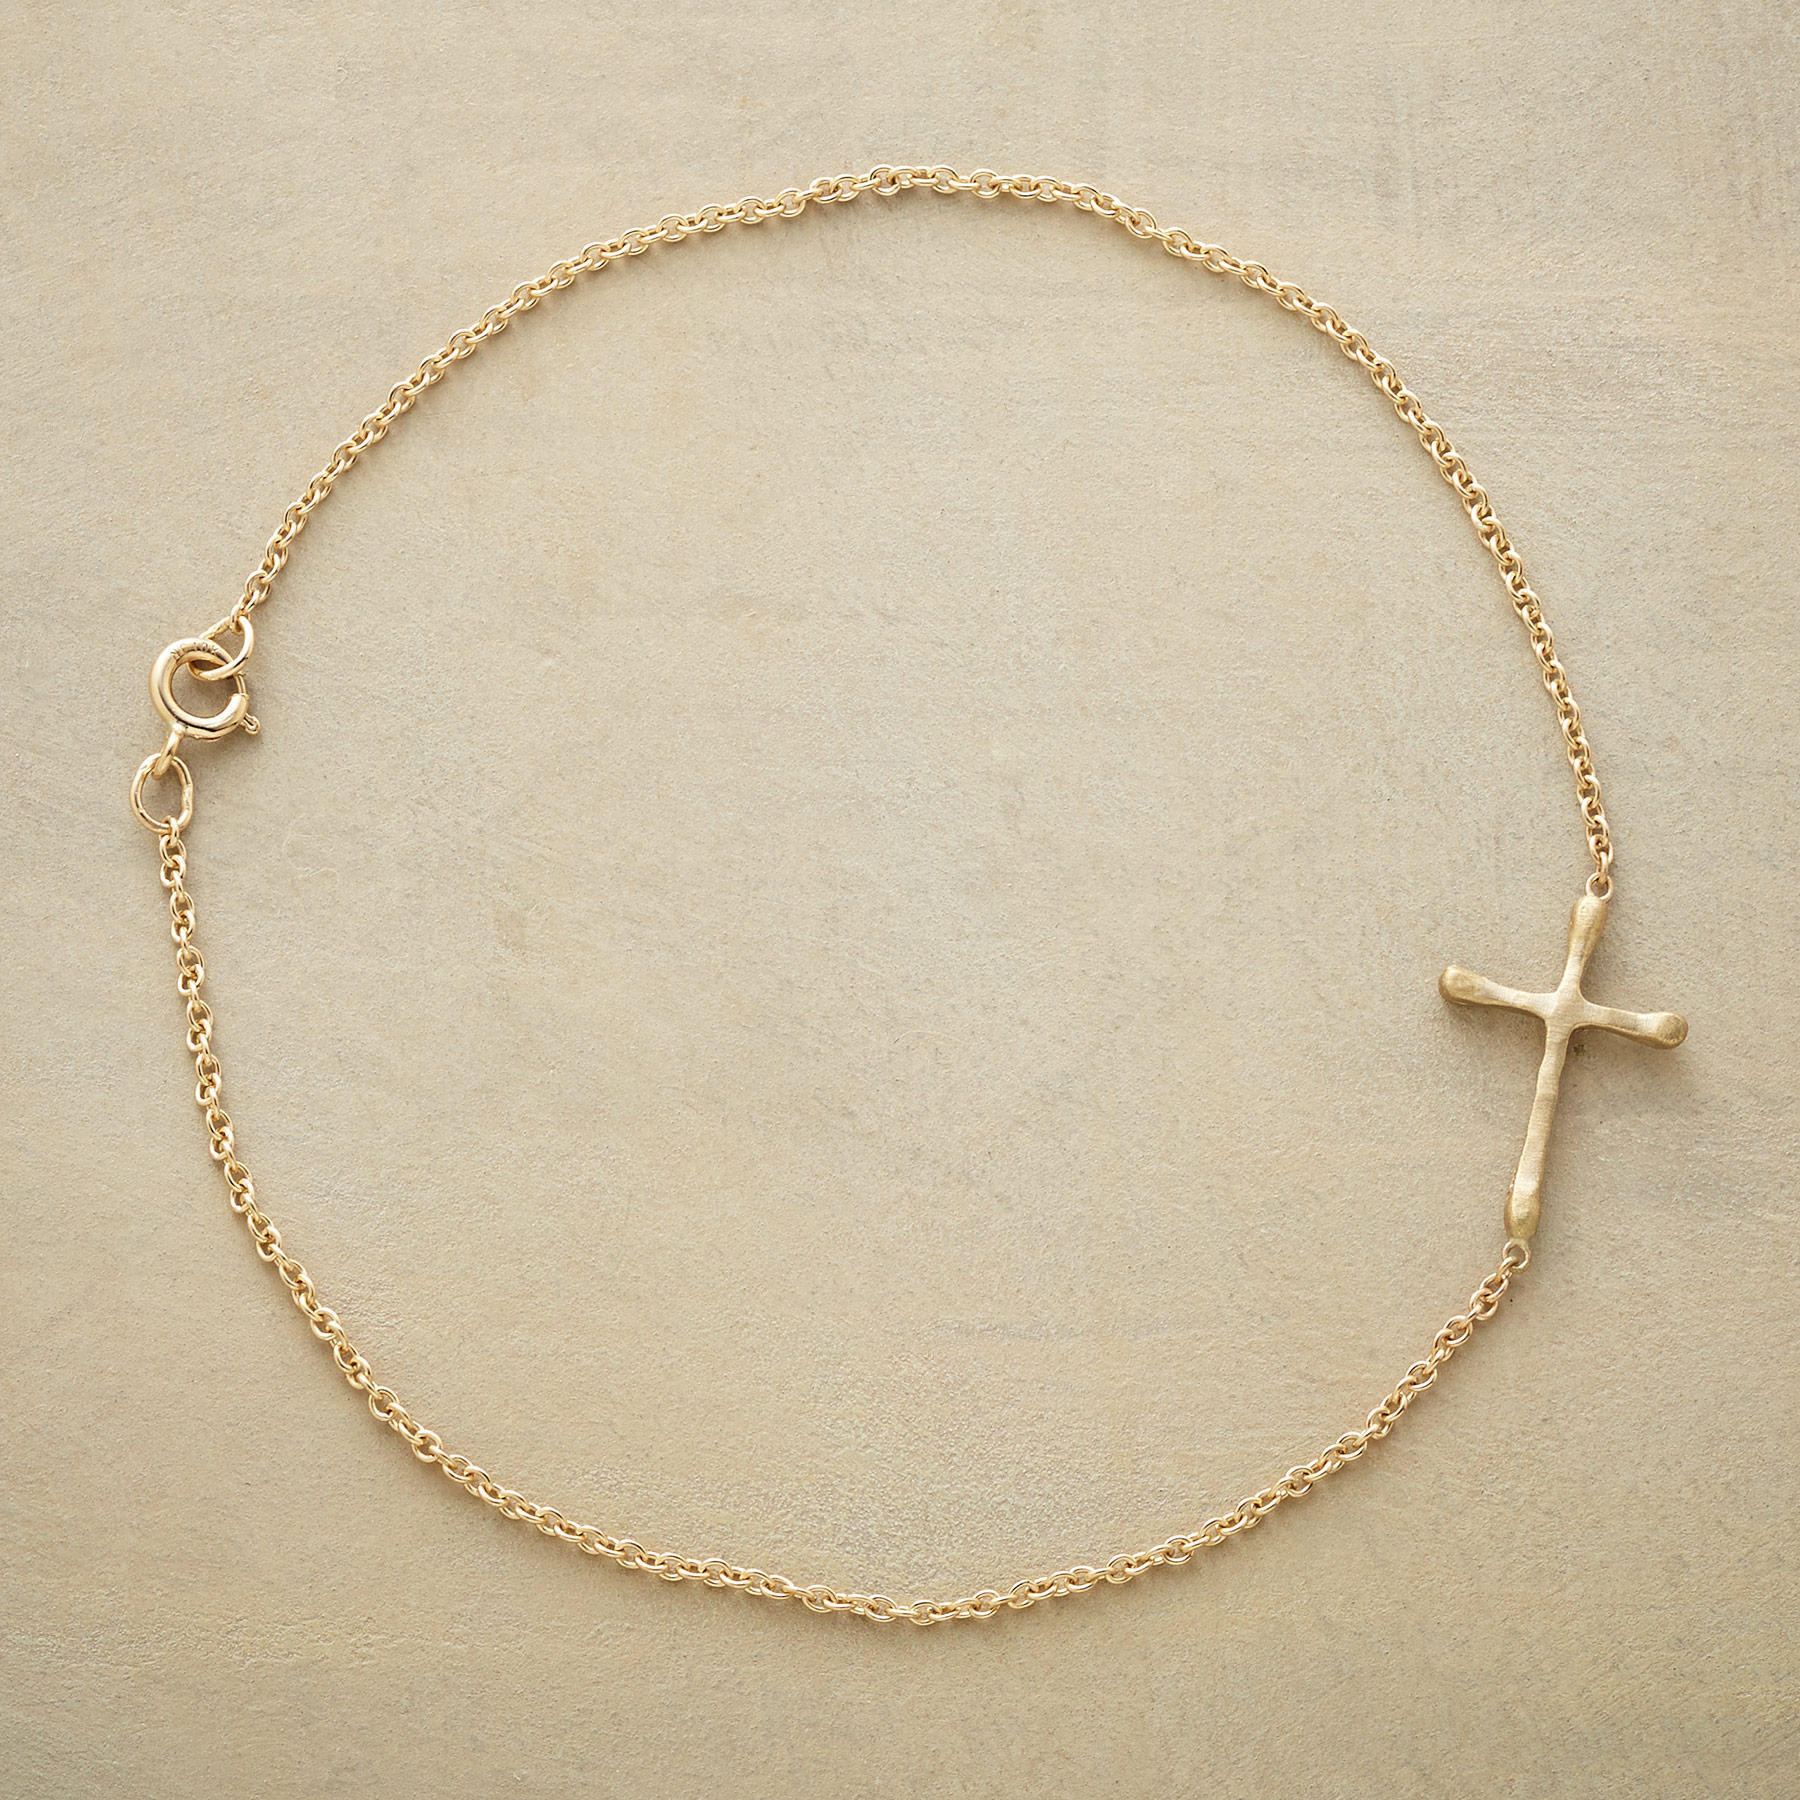 Gold Linked Cross Bracelet